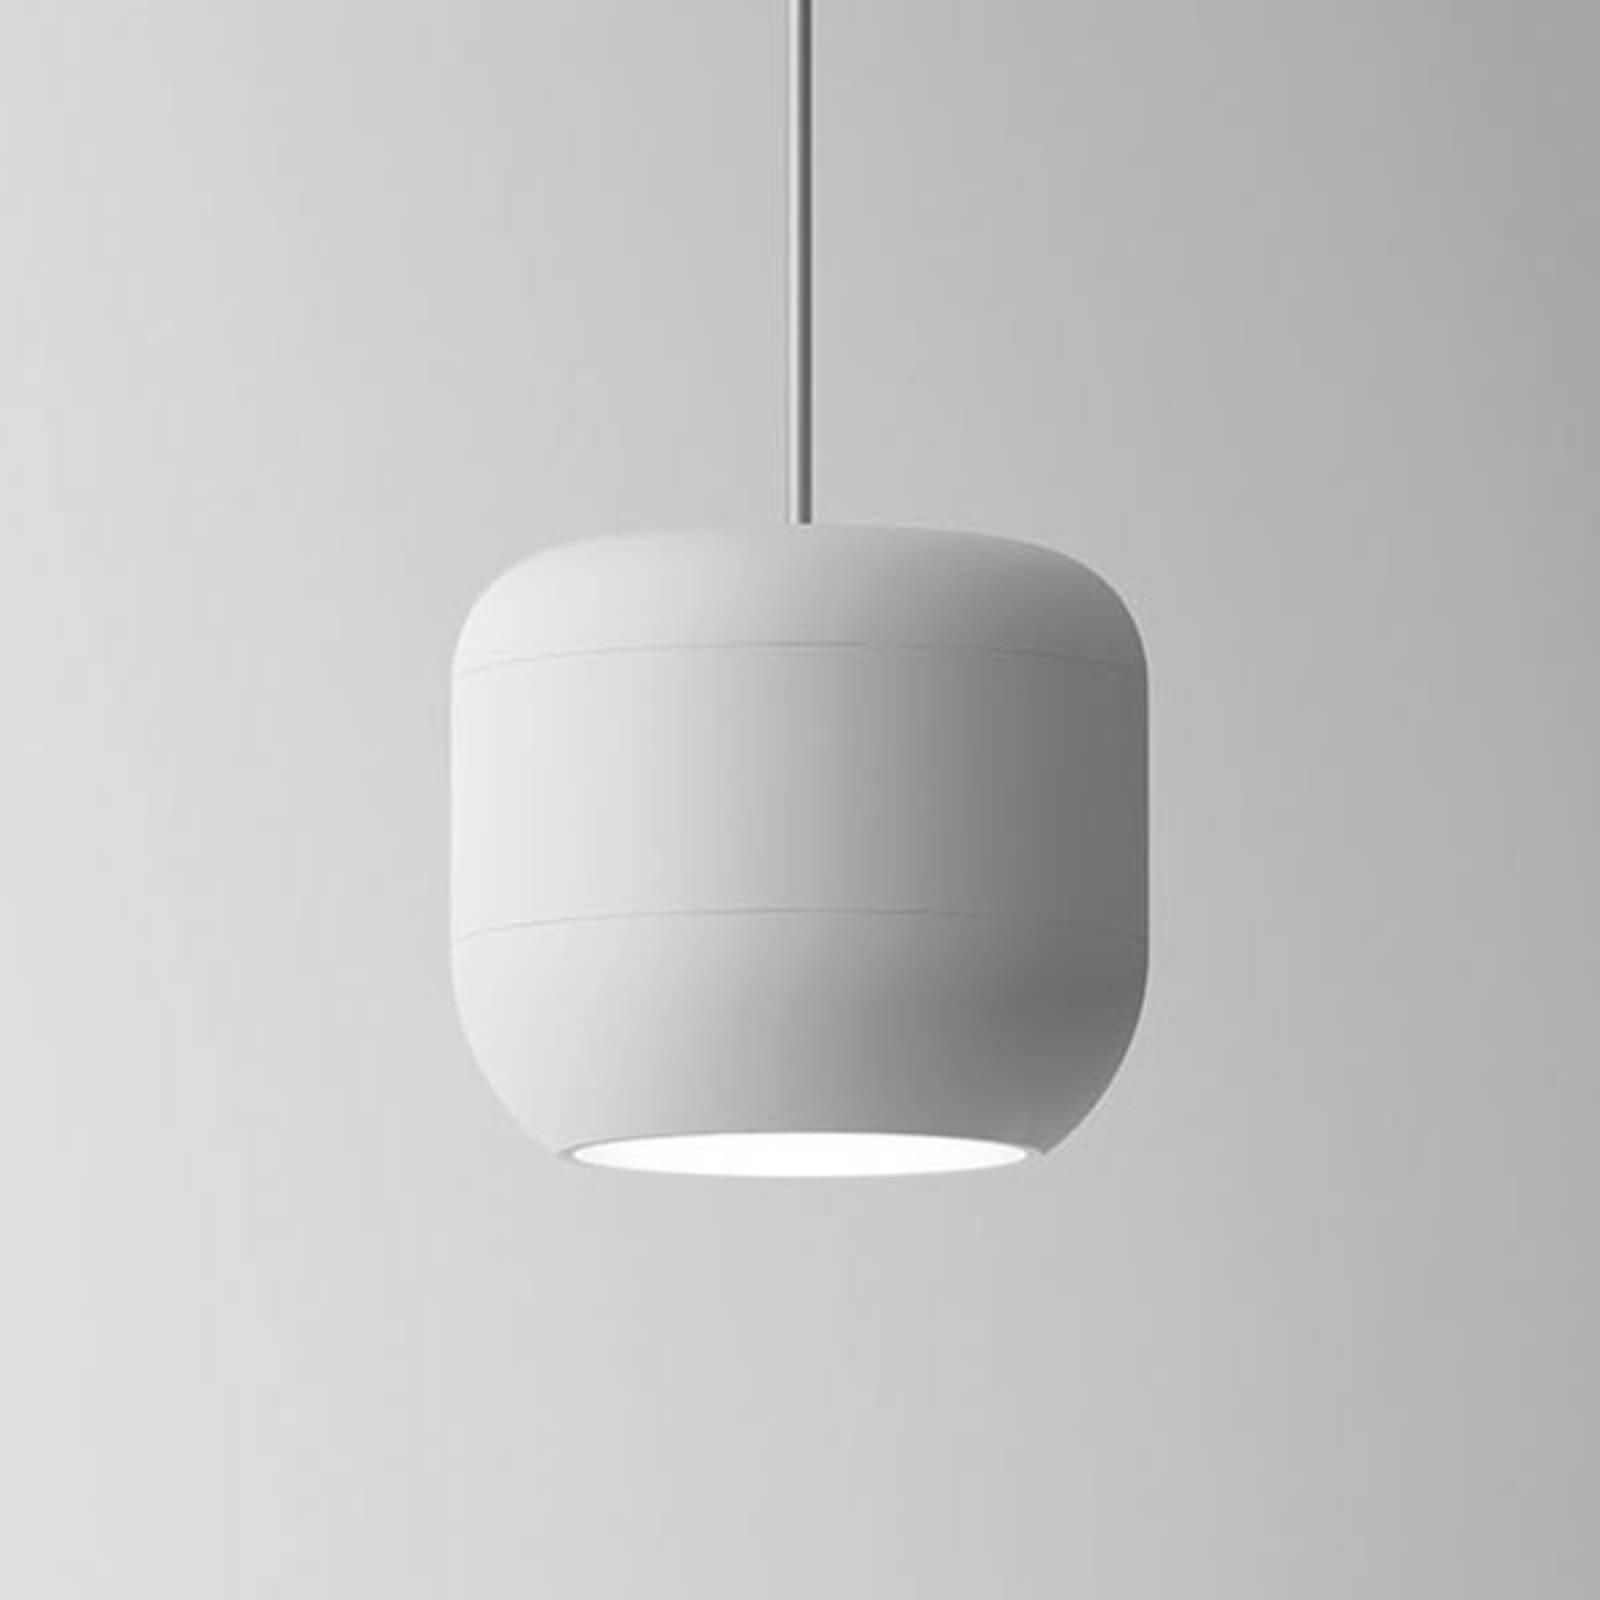 Axolight Urban LED hanglamp 16 cm wit